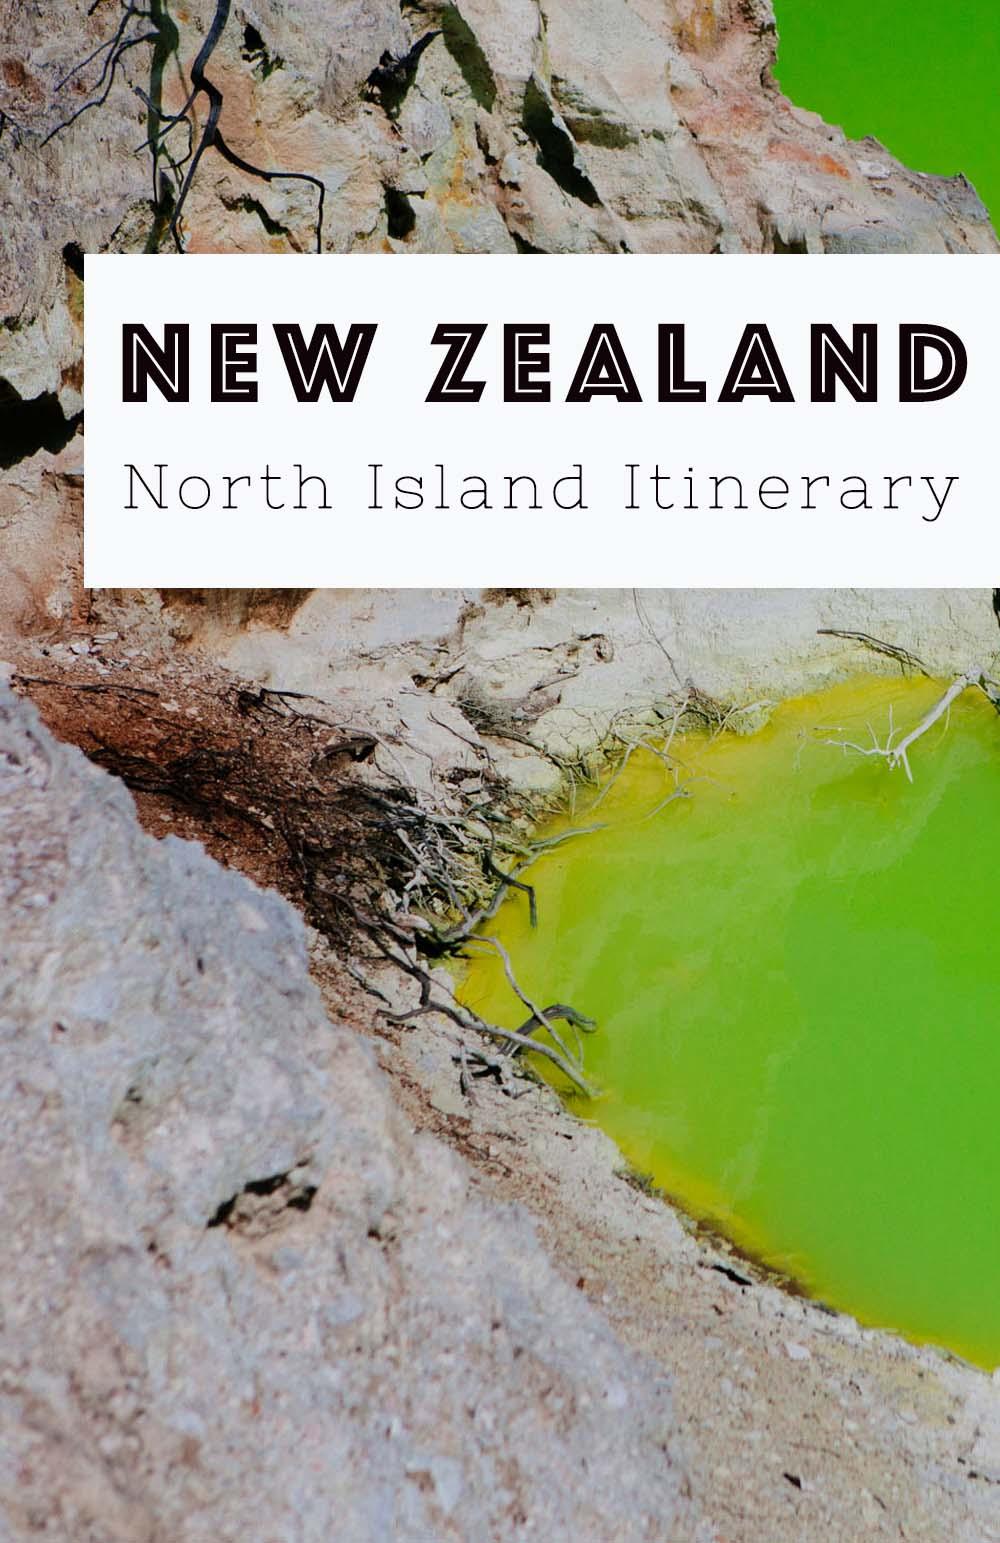 New Zealand South Island Itinerary Travel Blog